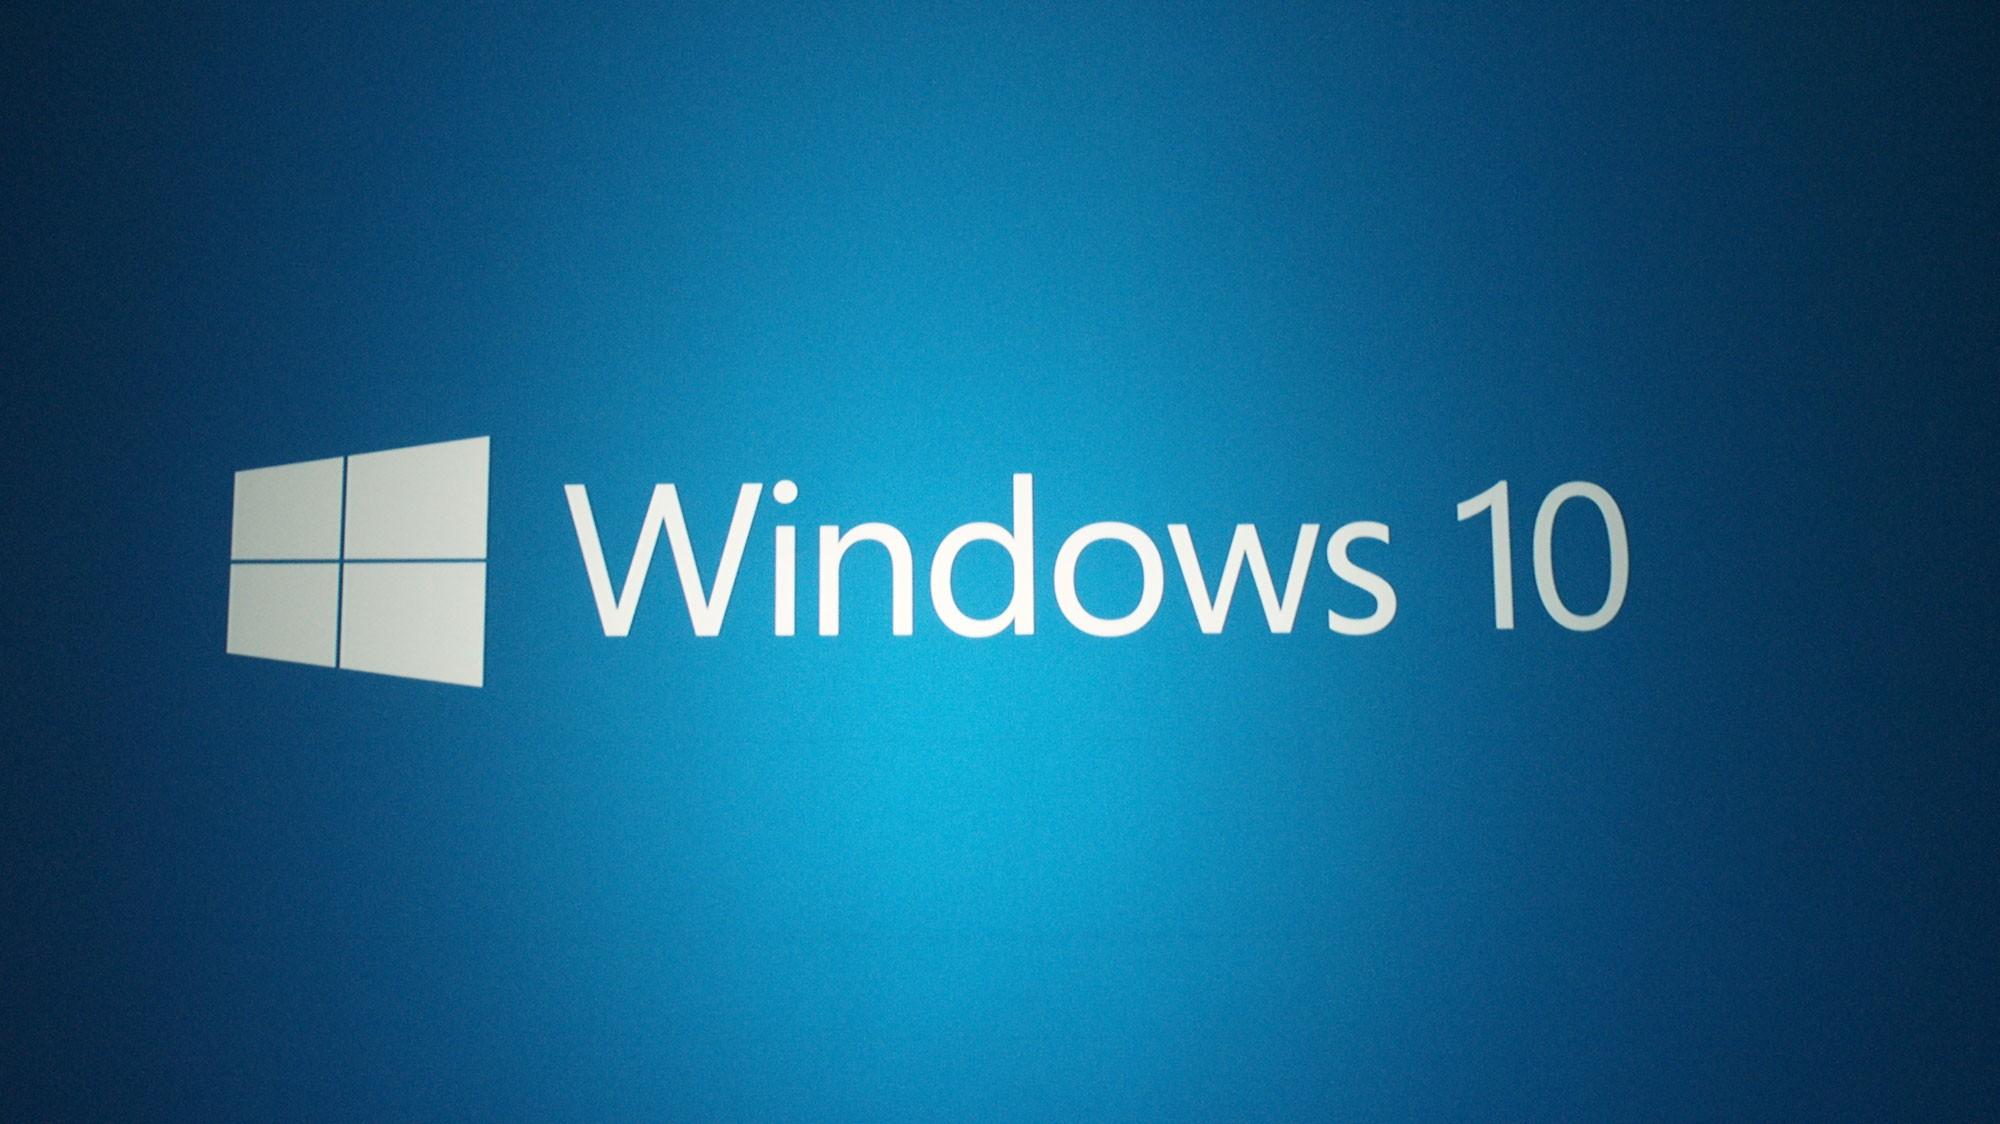 Microsoft предоставляет 30 дней для отката на предыдущую версию Windows